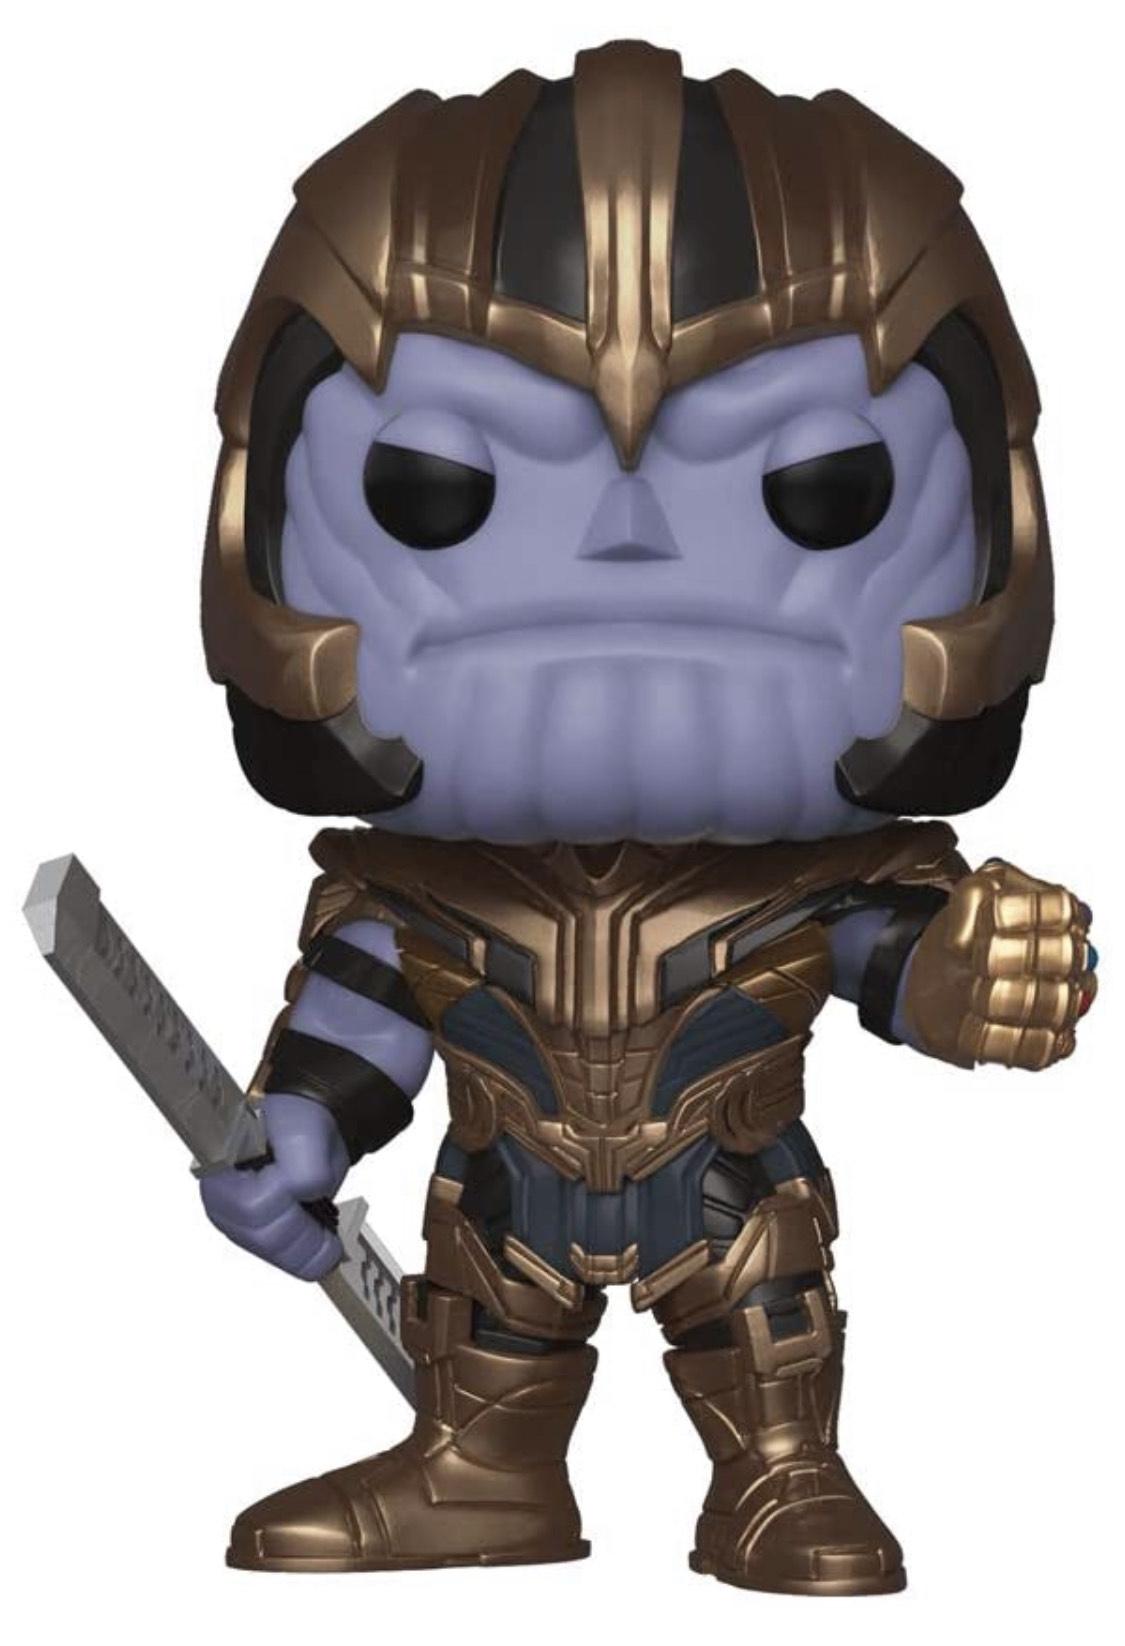 POP! Bobble: Avengers Endgame: Thanos und andere bei Thalia